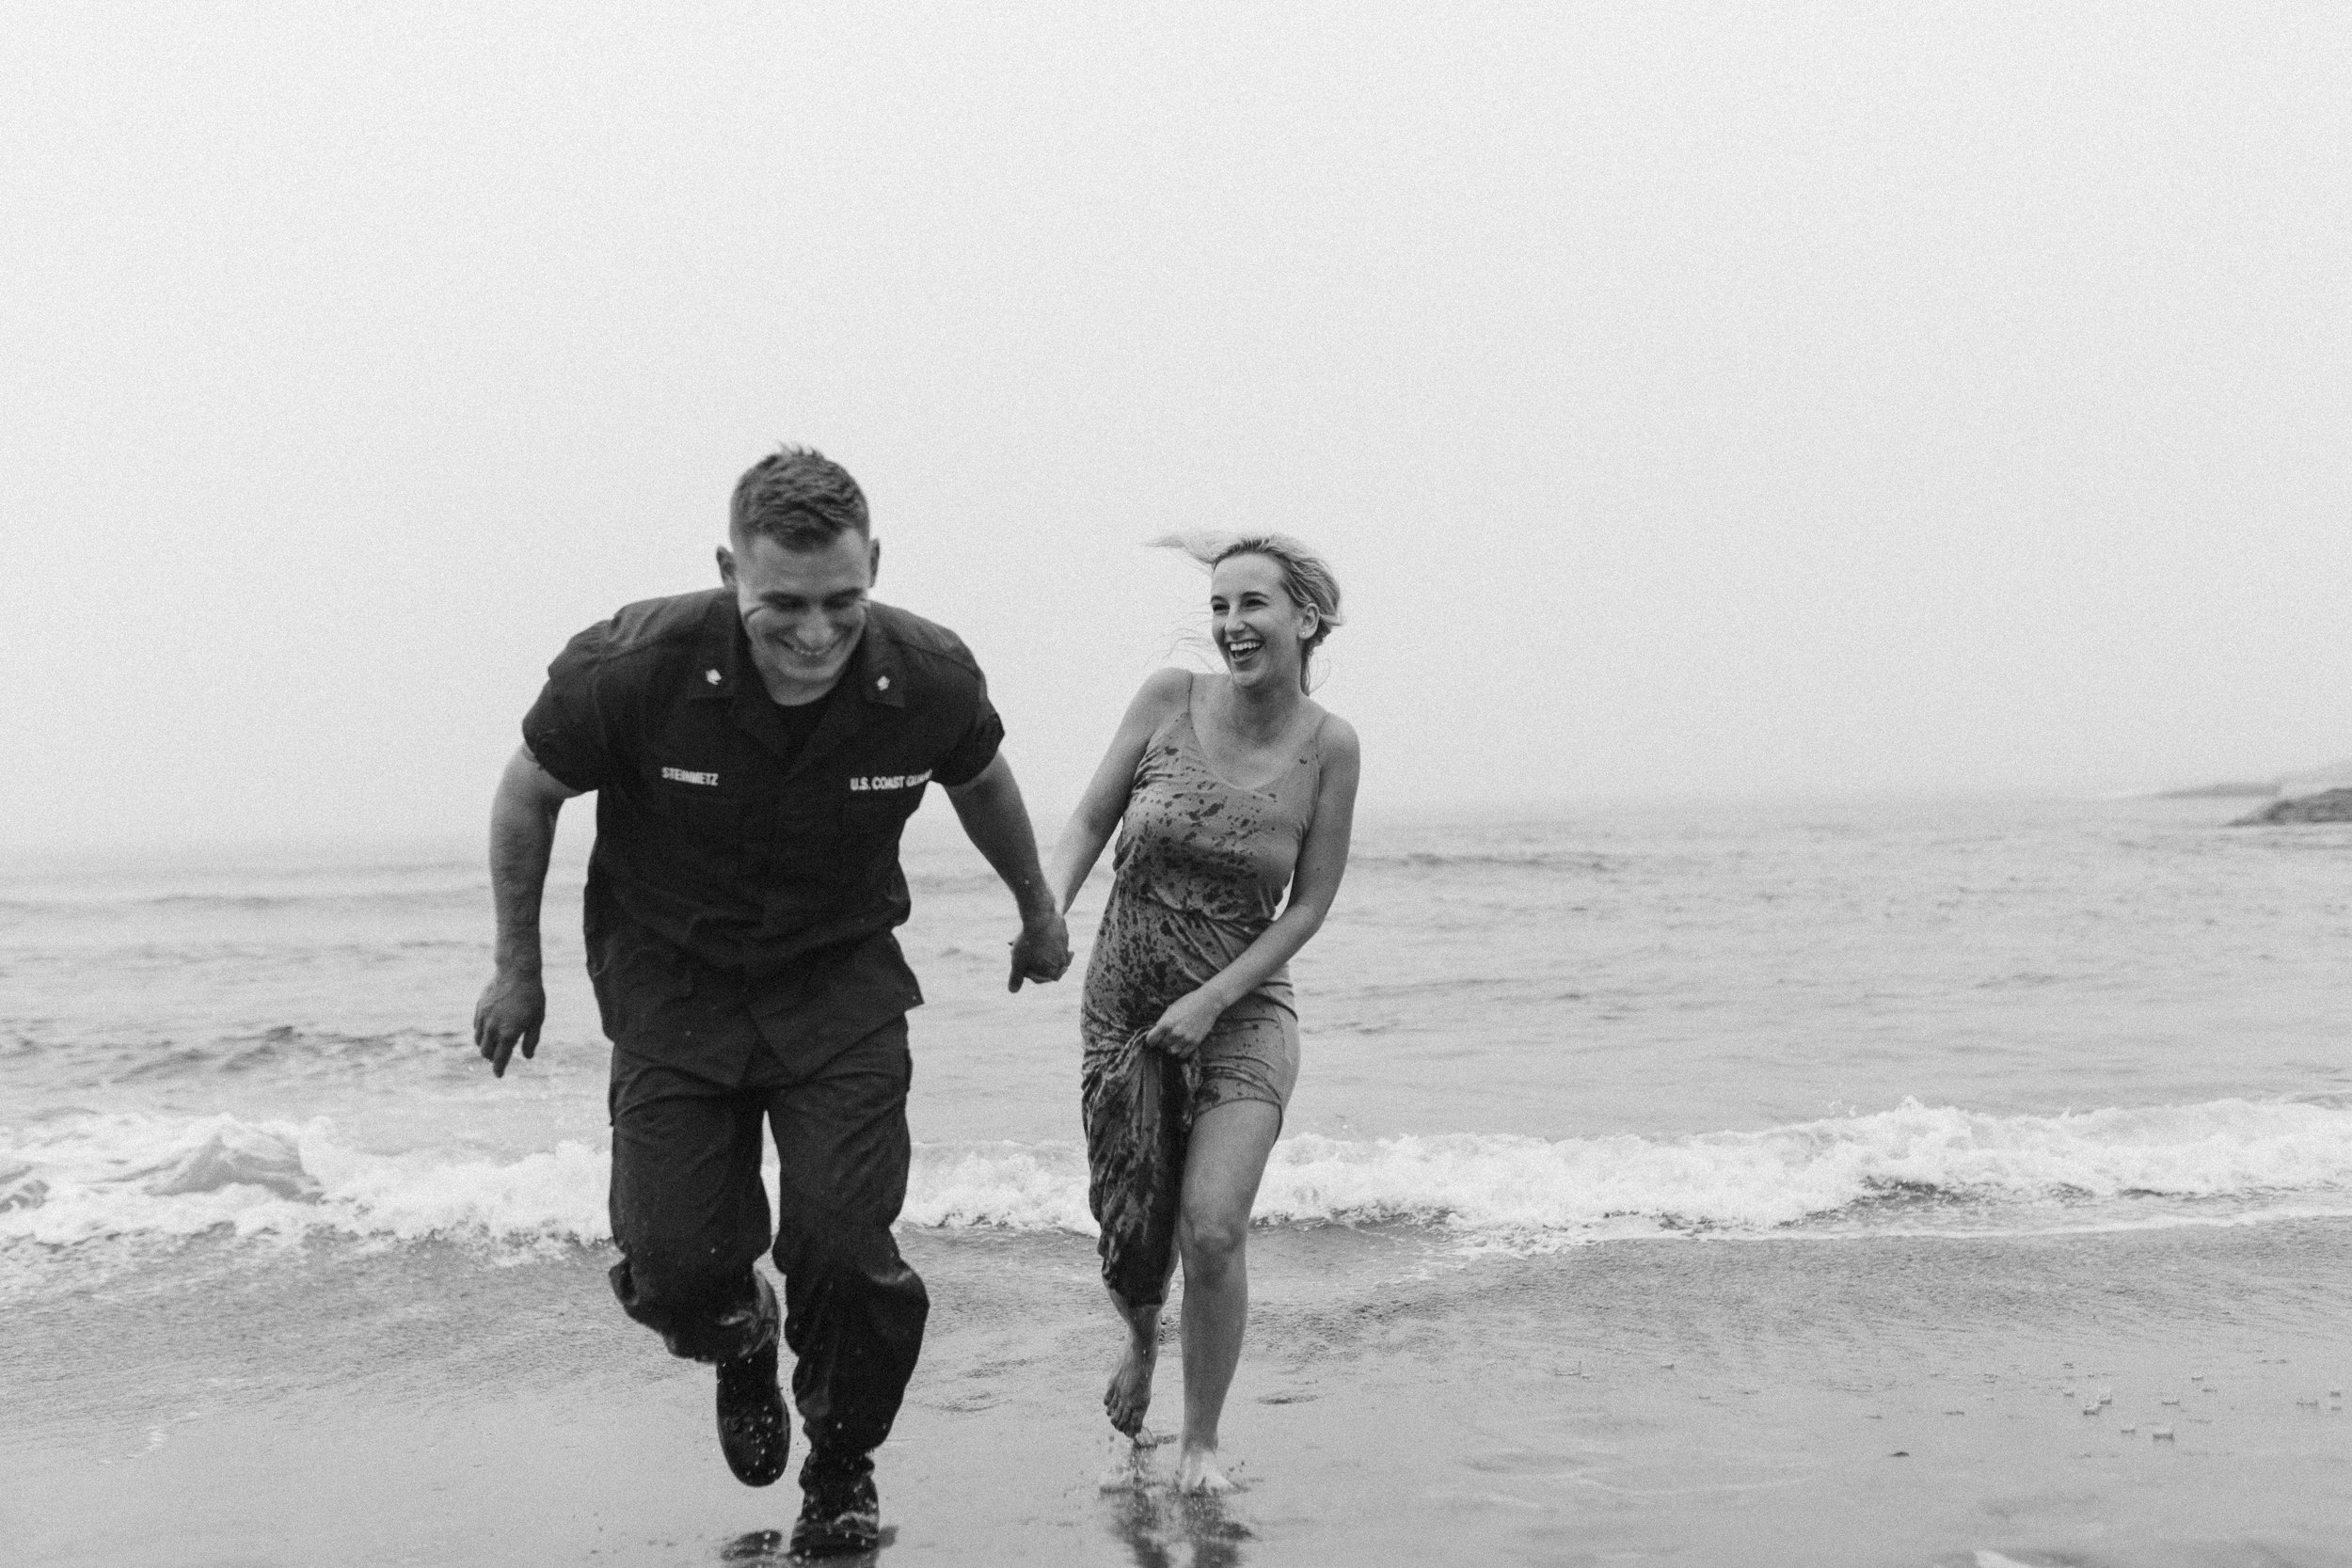 Nicole-daacke-photography-cape-kiwanda-foggy-adventure-session-engagement-session-anniversary-photos-oregon-coast-pacific-city-oregon-elopement-photographer-39.jpg